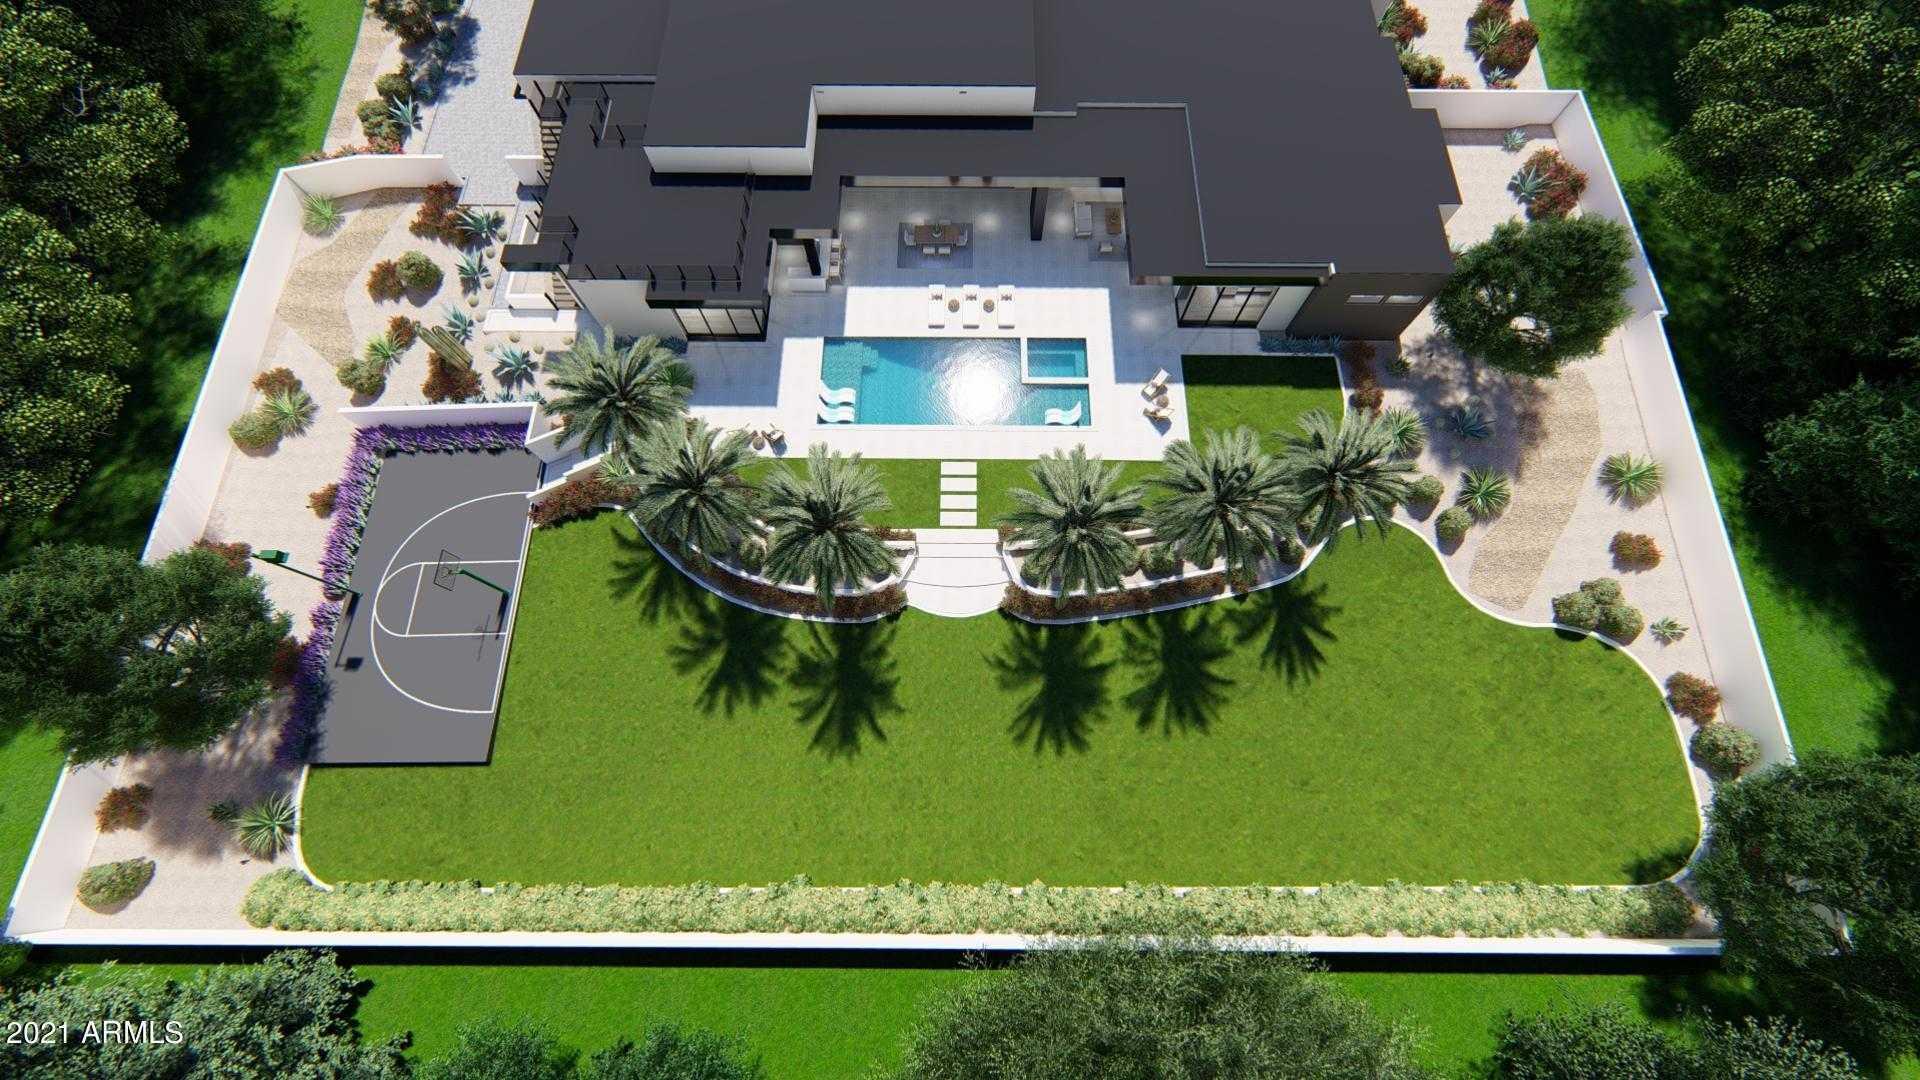 $4,850,000 - 6Br/7Ba - Home for Sale in Mirada Los Arcos, Paradise Valley